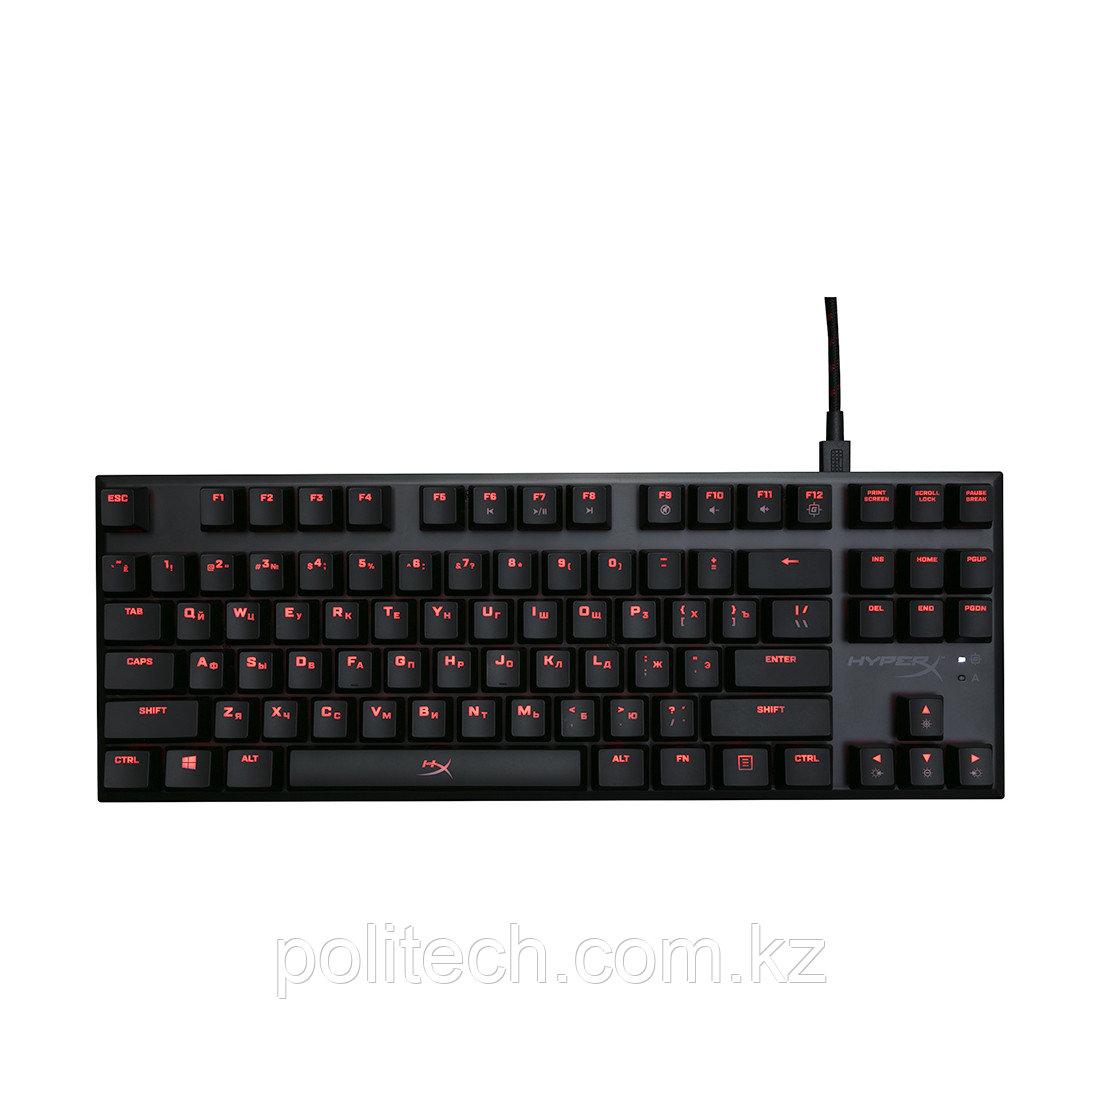 Клавиатура HyperX Alloy FPS Pro Mechanical Gaming MX Red HX-KB4RD1-RU/R1